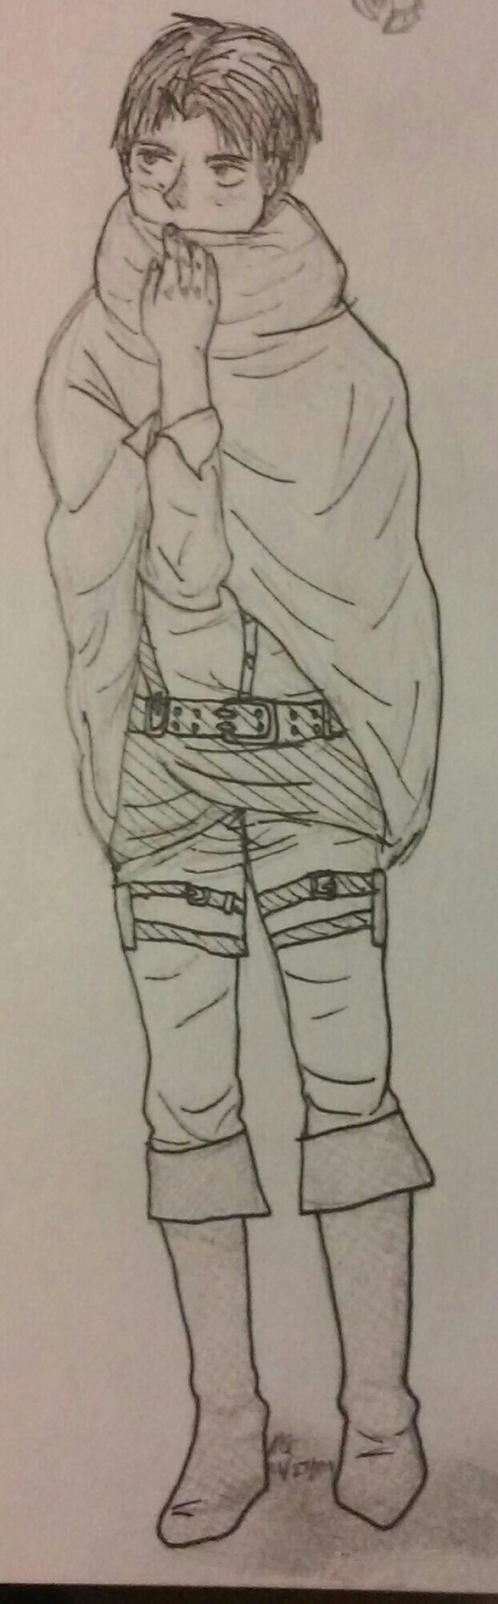 Levi Sketch by magicshoppingcart